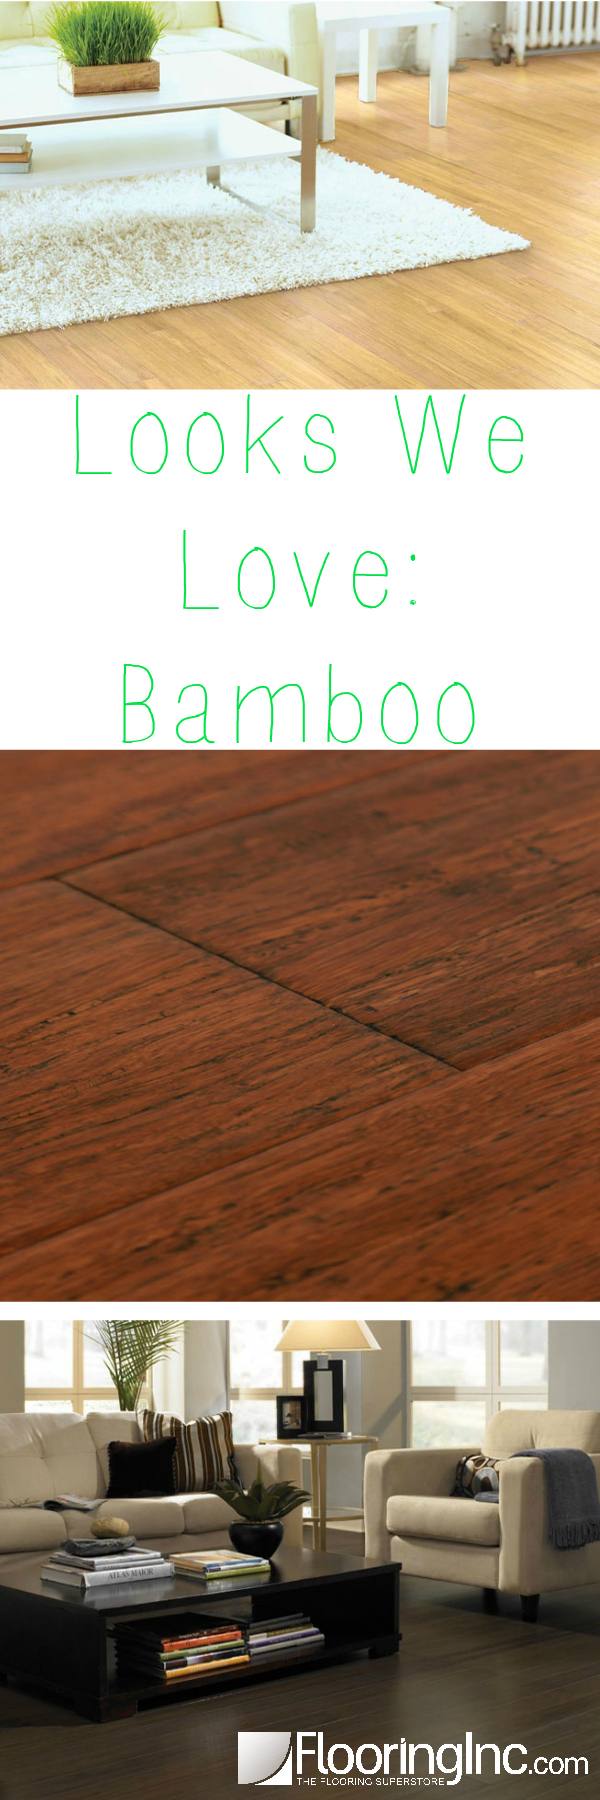 Looks We Love Bamboo Flooringinc Blog